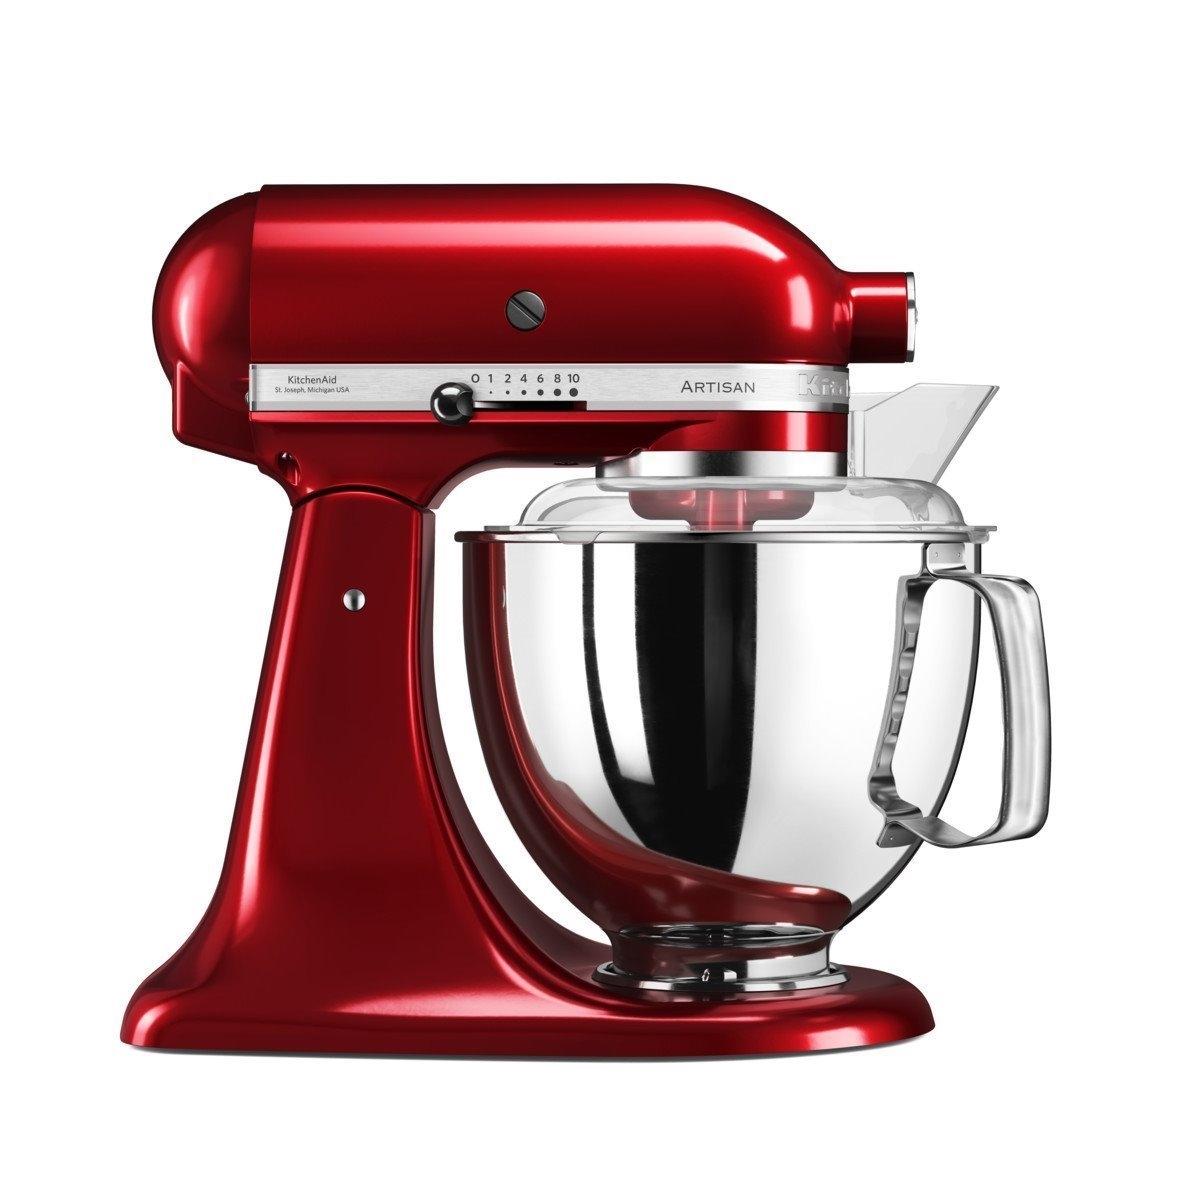 Mixer cu bol Artisan Elegance 5KSM175PSECA 48 L Candy Apple 300W KitchenAid